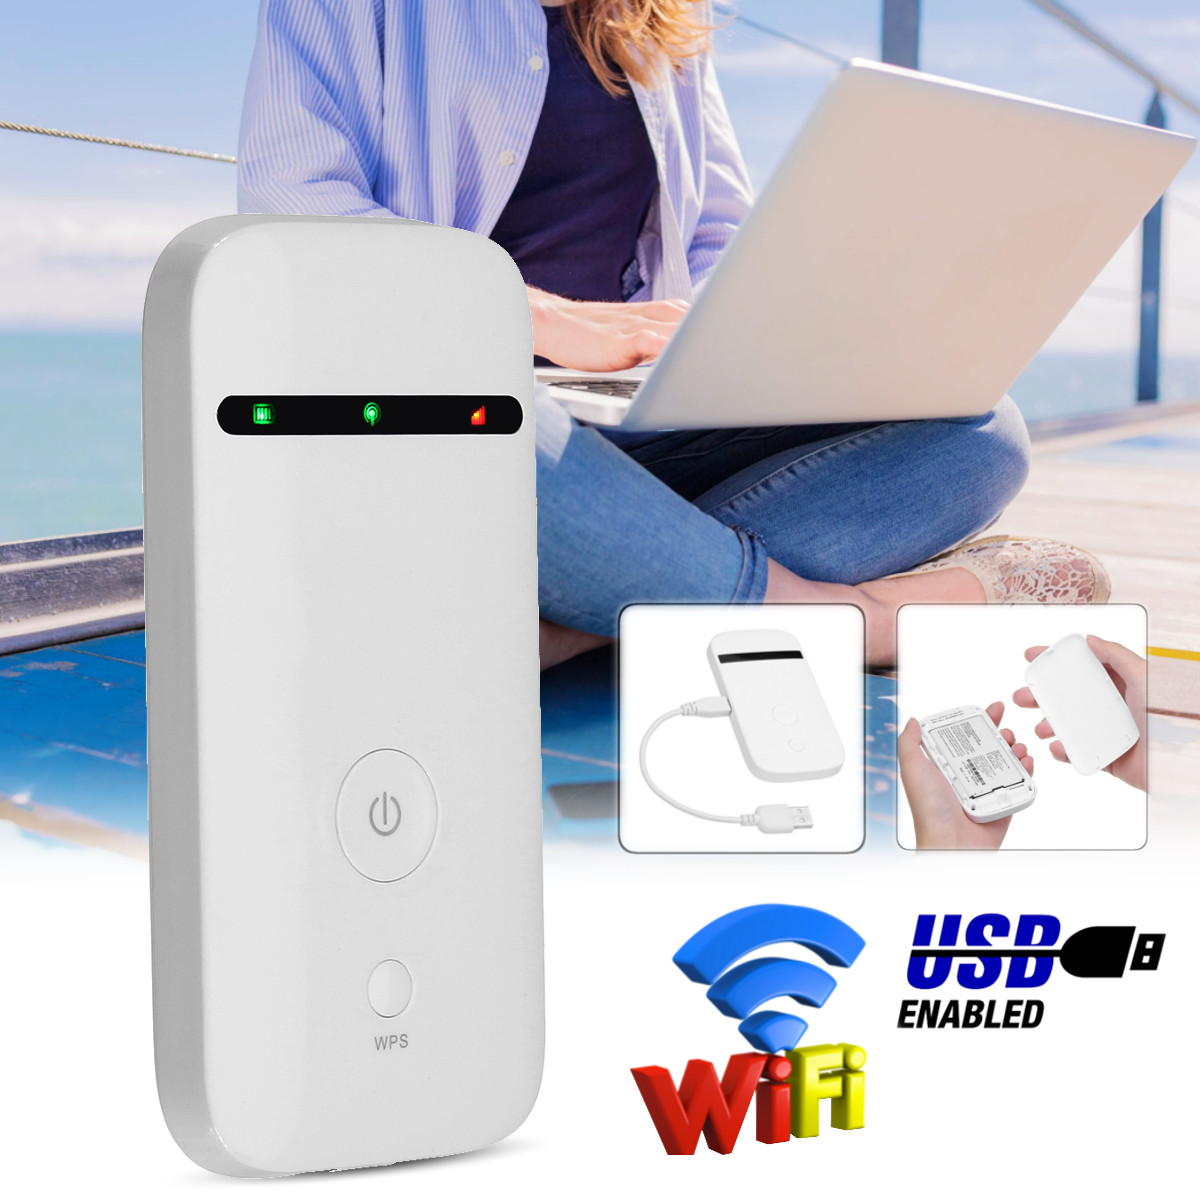 Unlockeds 3G Routers Built-in Antenna 802.11 G/b/n 100Mbs P Ockets WIFI Broadband 3G SIM Card Mifi Router